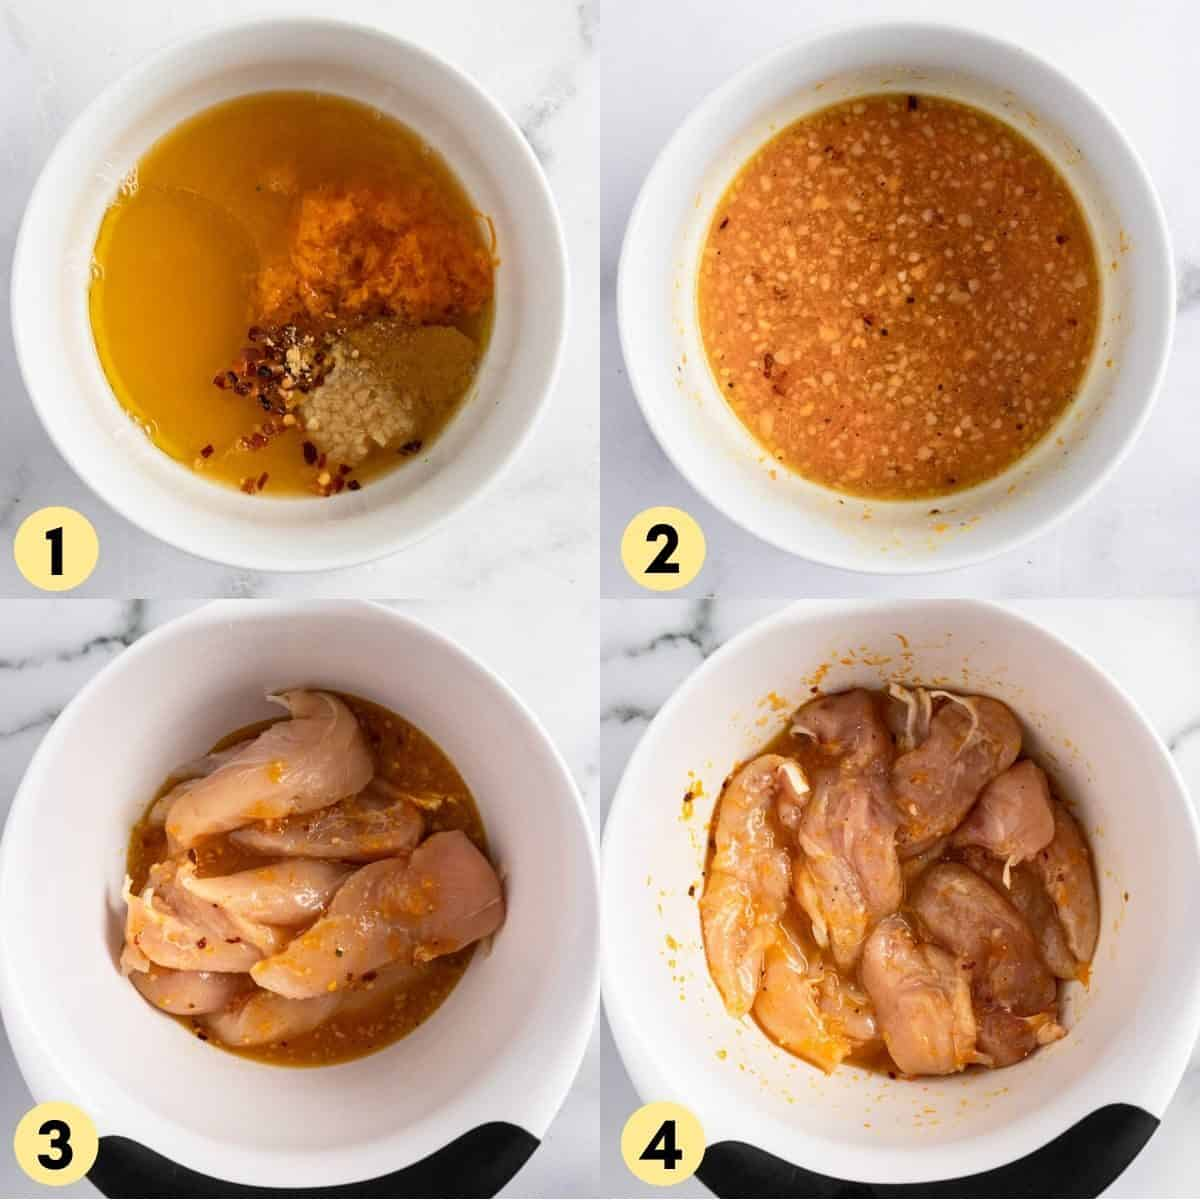 Orange chicken sauce with tenderloins in bowl.